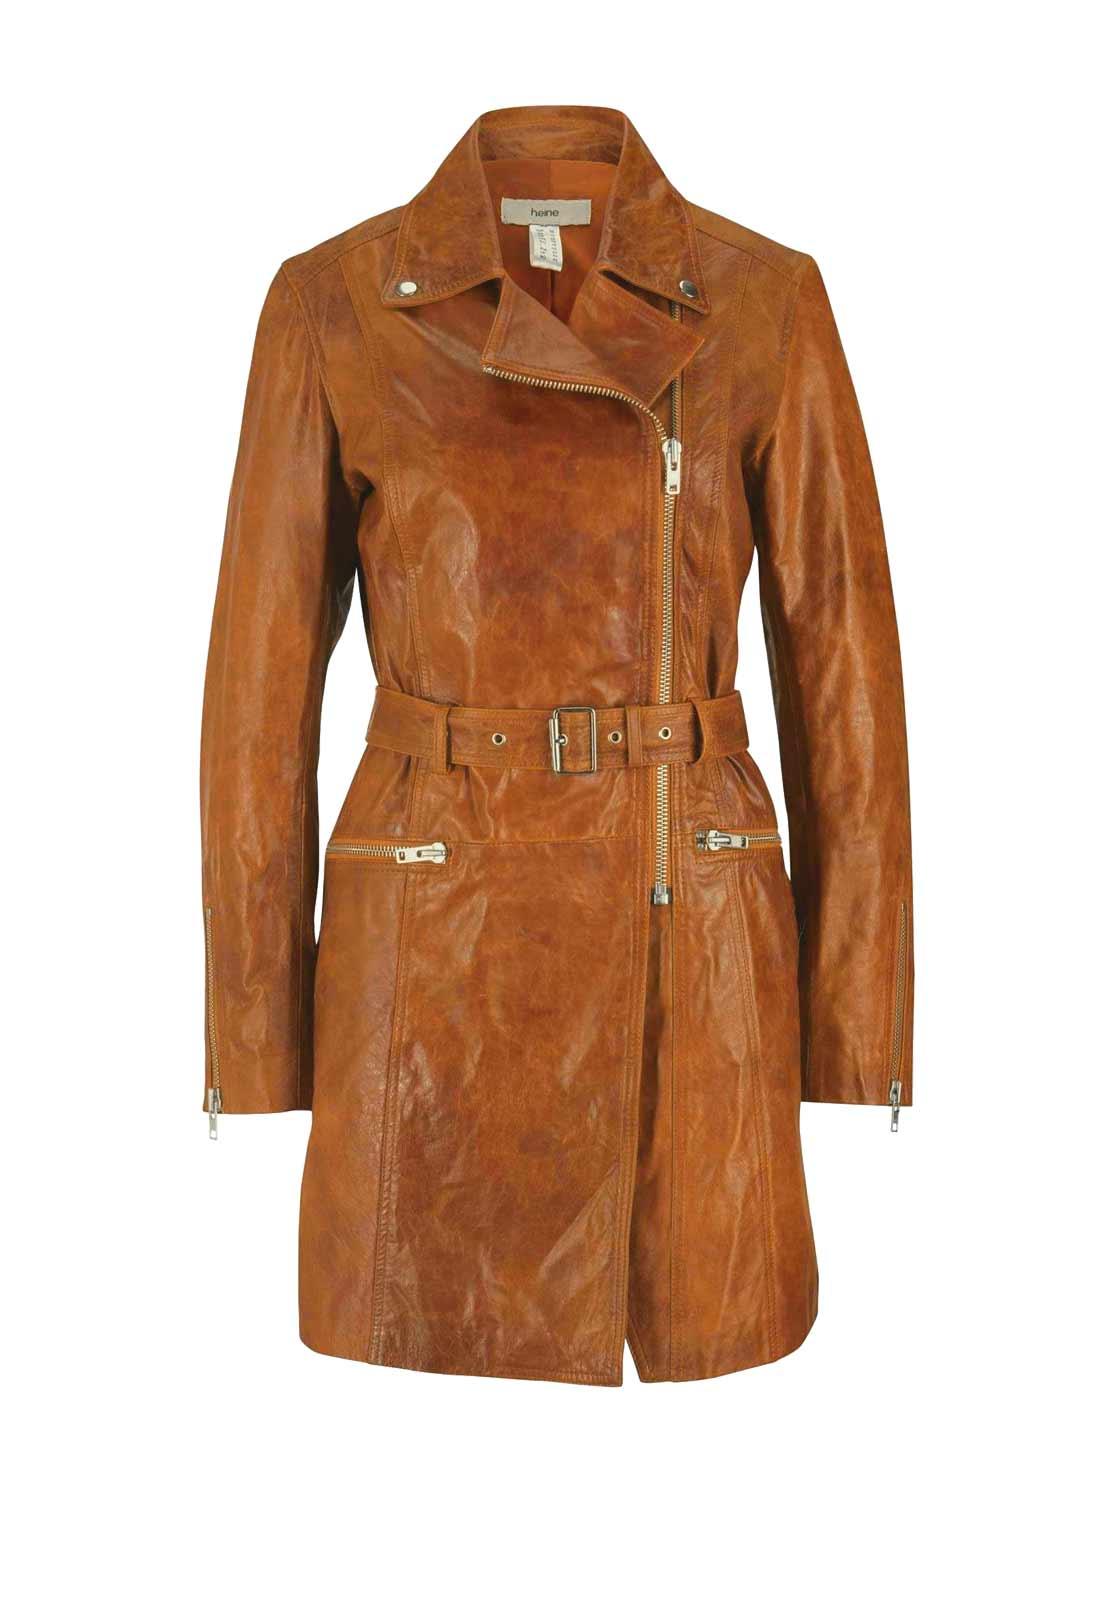 Damenmäntel Frühjahr 2021 HEINE Damen Designer-Lammnappa-Ledermantel Mantel Echt Leder 44 Cognac Braun 674.362 Missforty